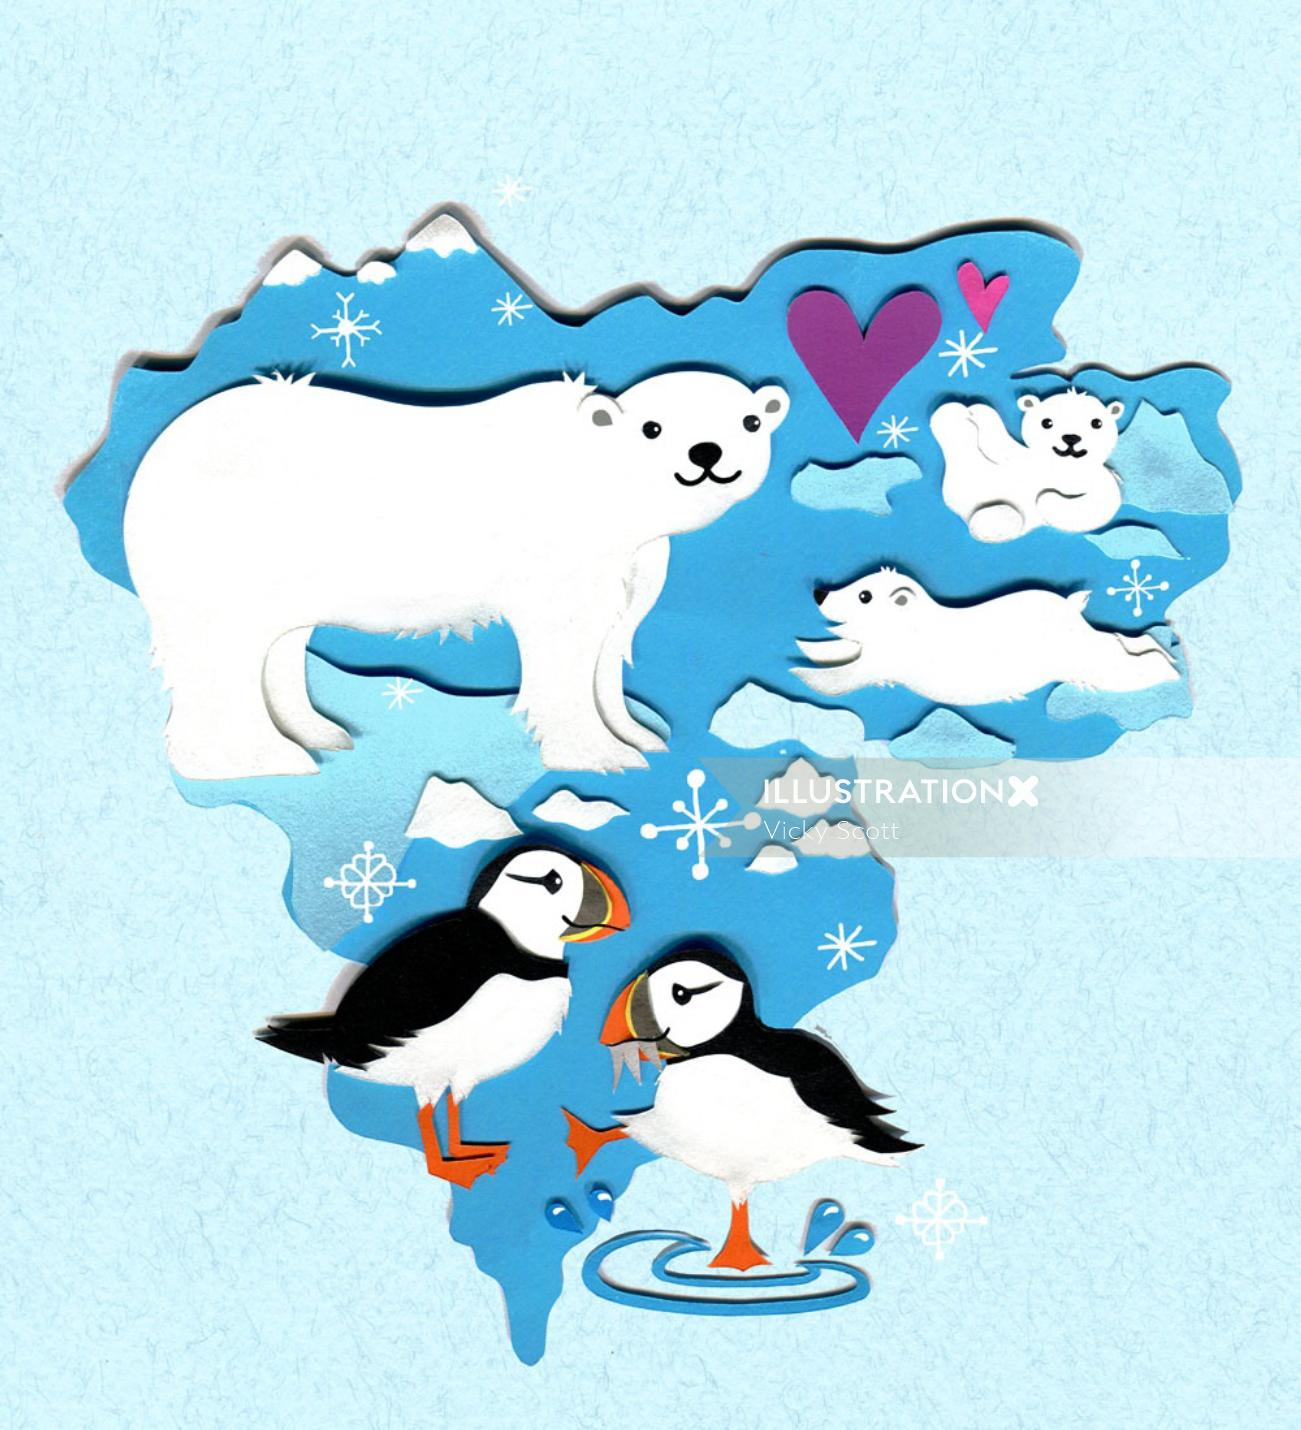 polar bear, puffins, north pole, winter, map, wildlife, animals, snow